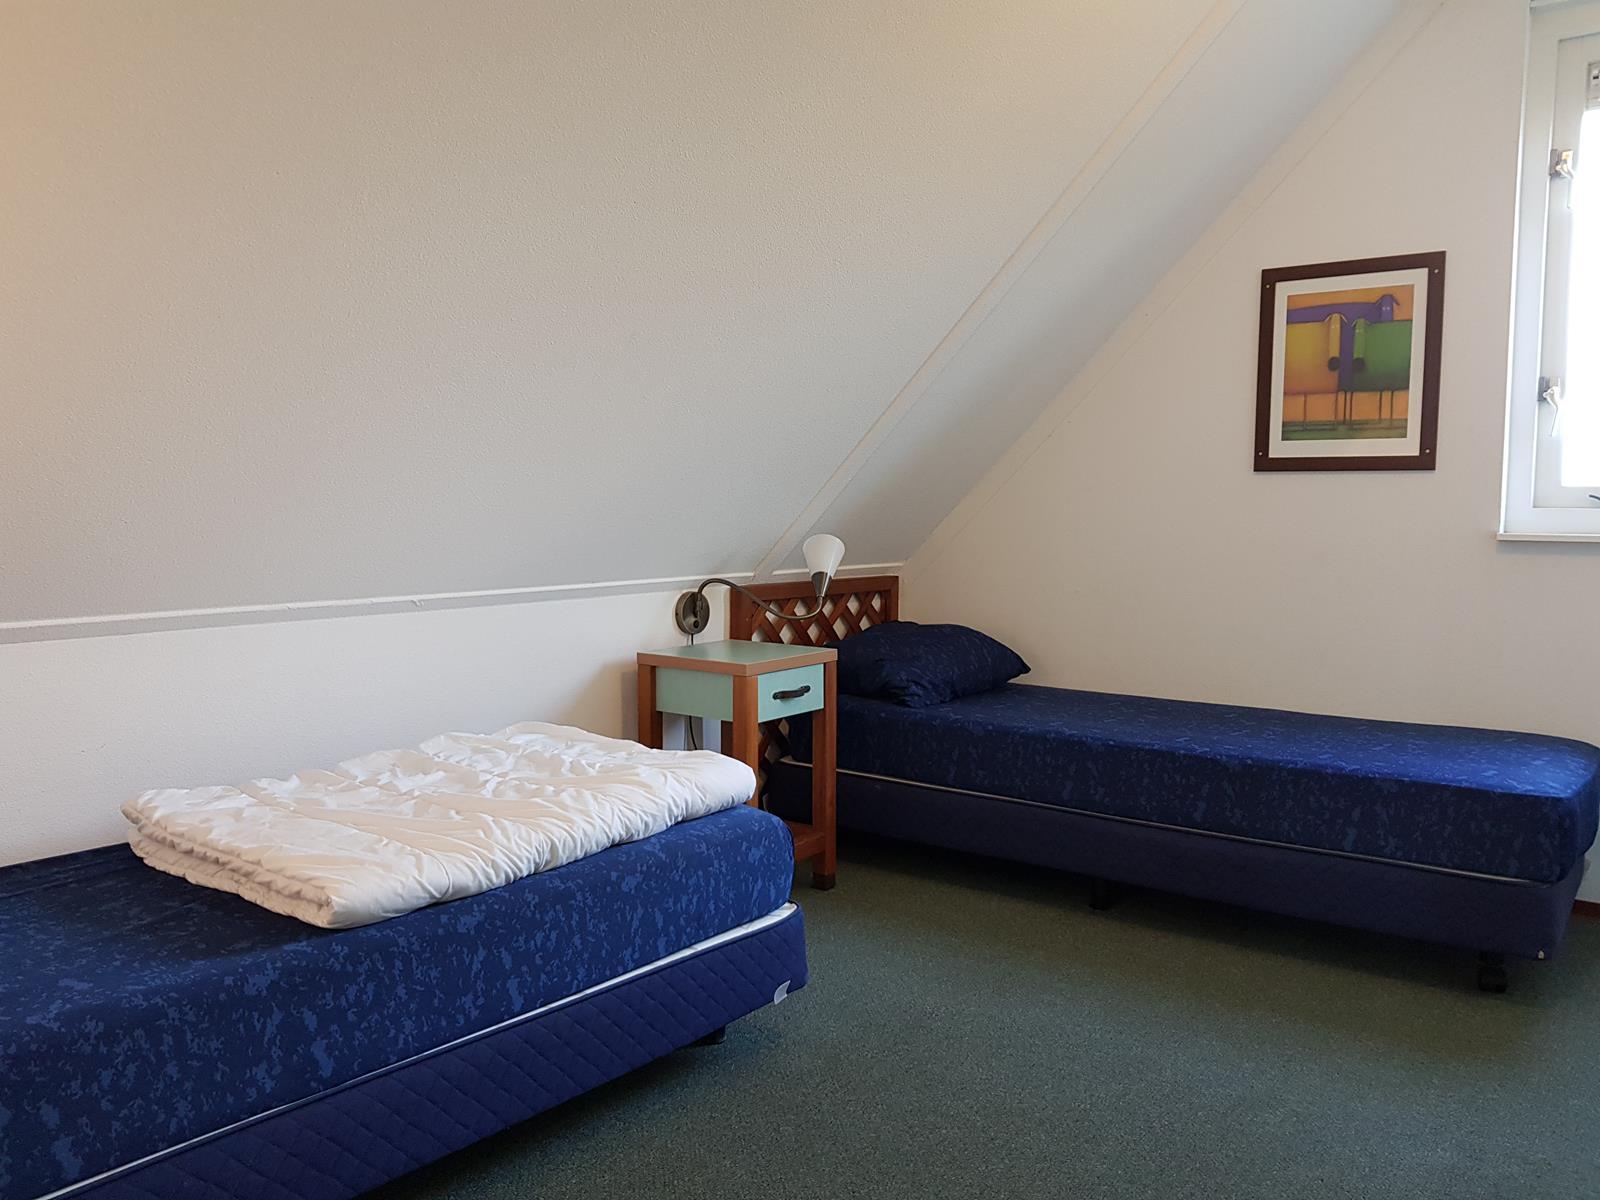 Vakantiehuis te koop Zeeland Bruinisse K155 (15).jpg